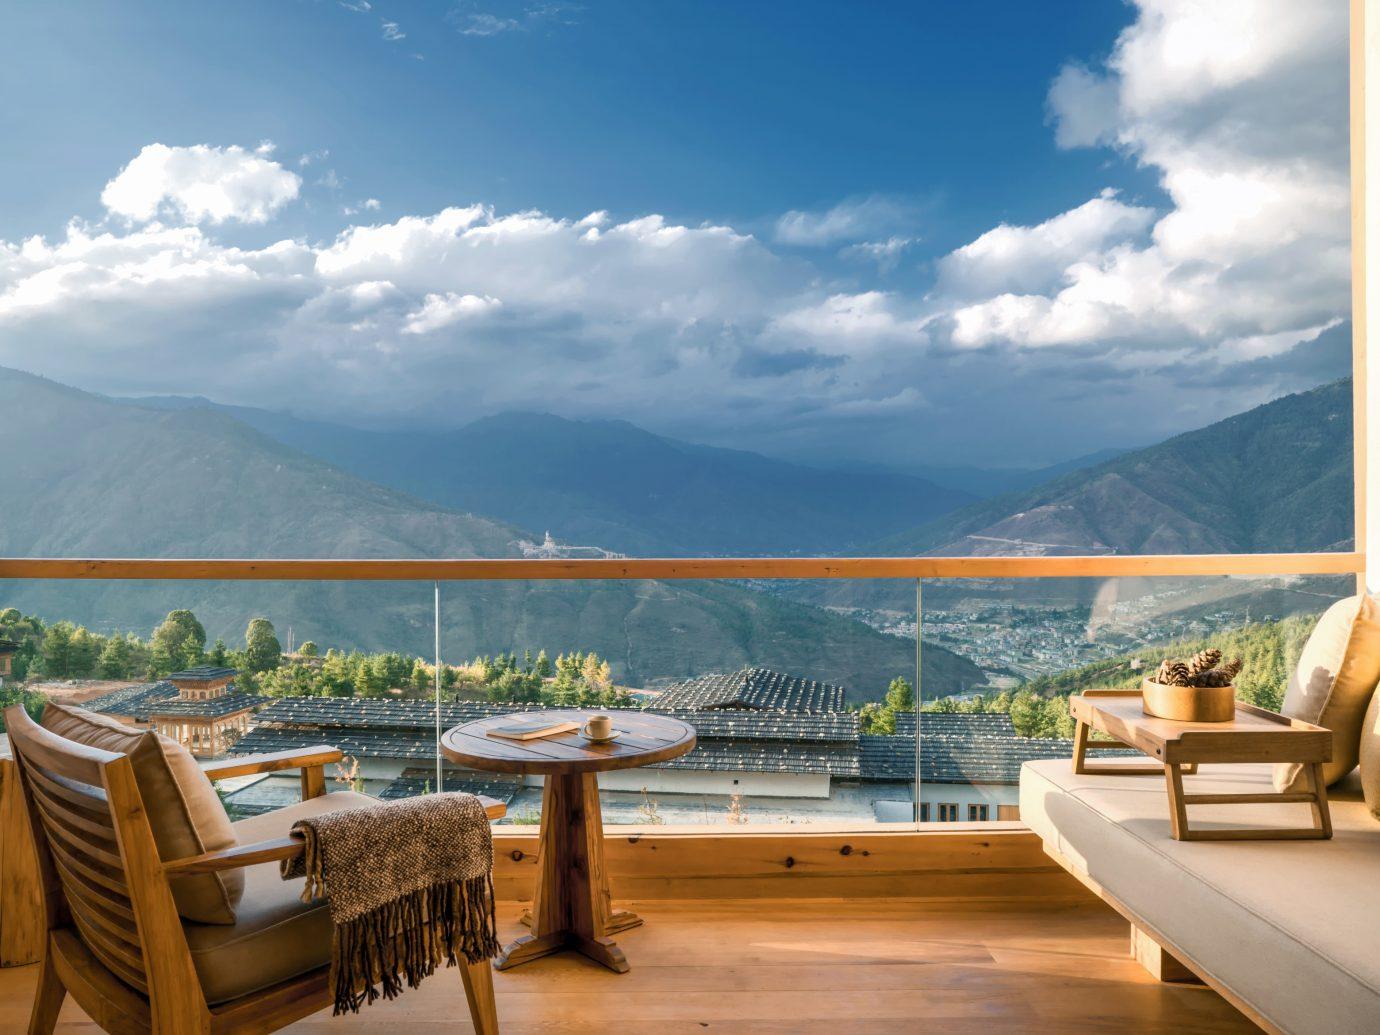 Balcony of the Lodge Suite at Six Senses Bhutan